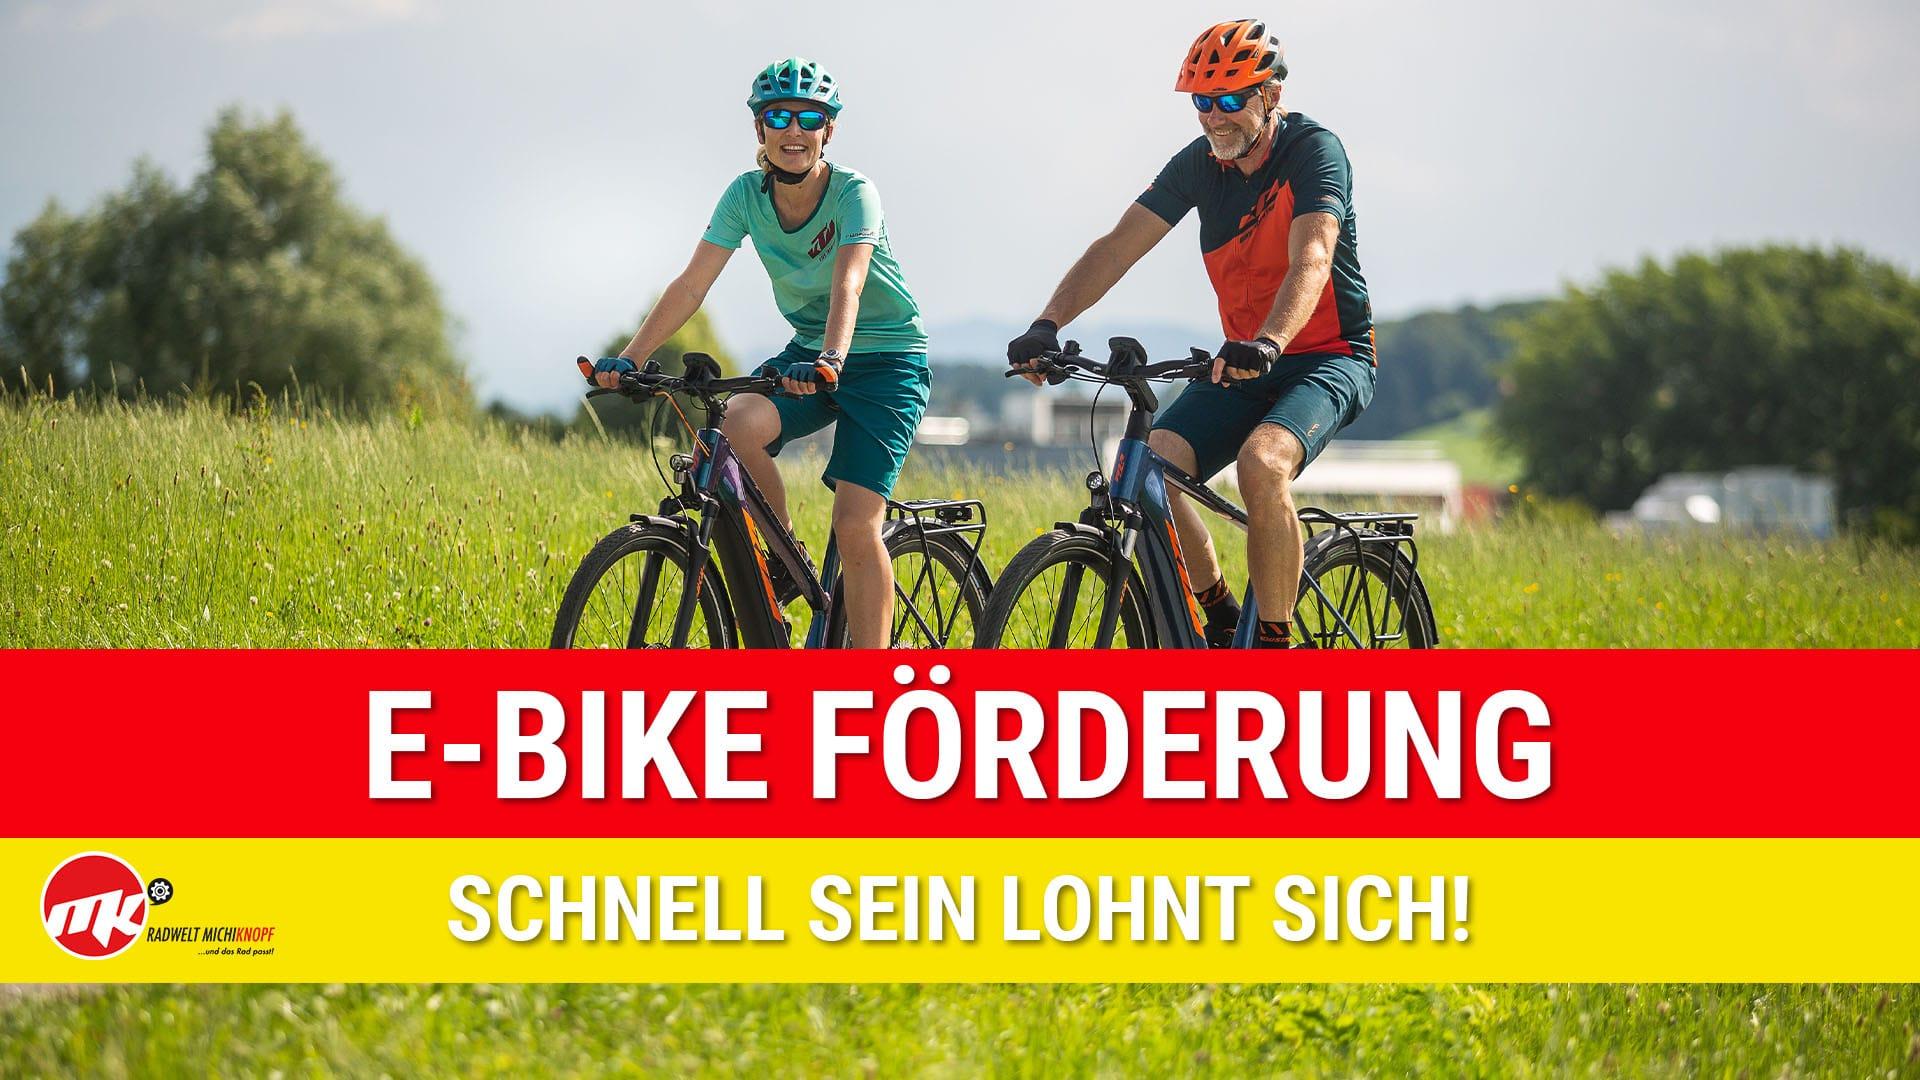 E Bike Förderung 2021 Burgenland